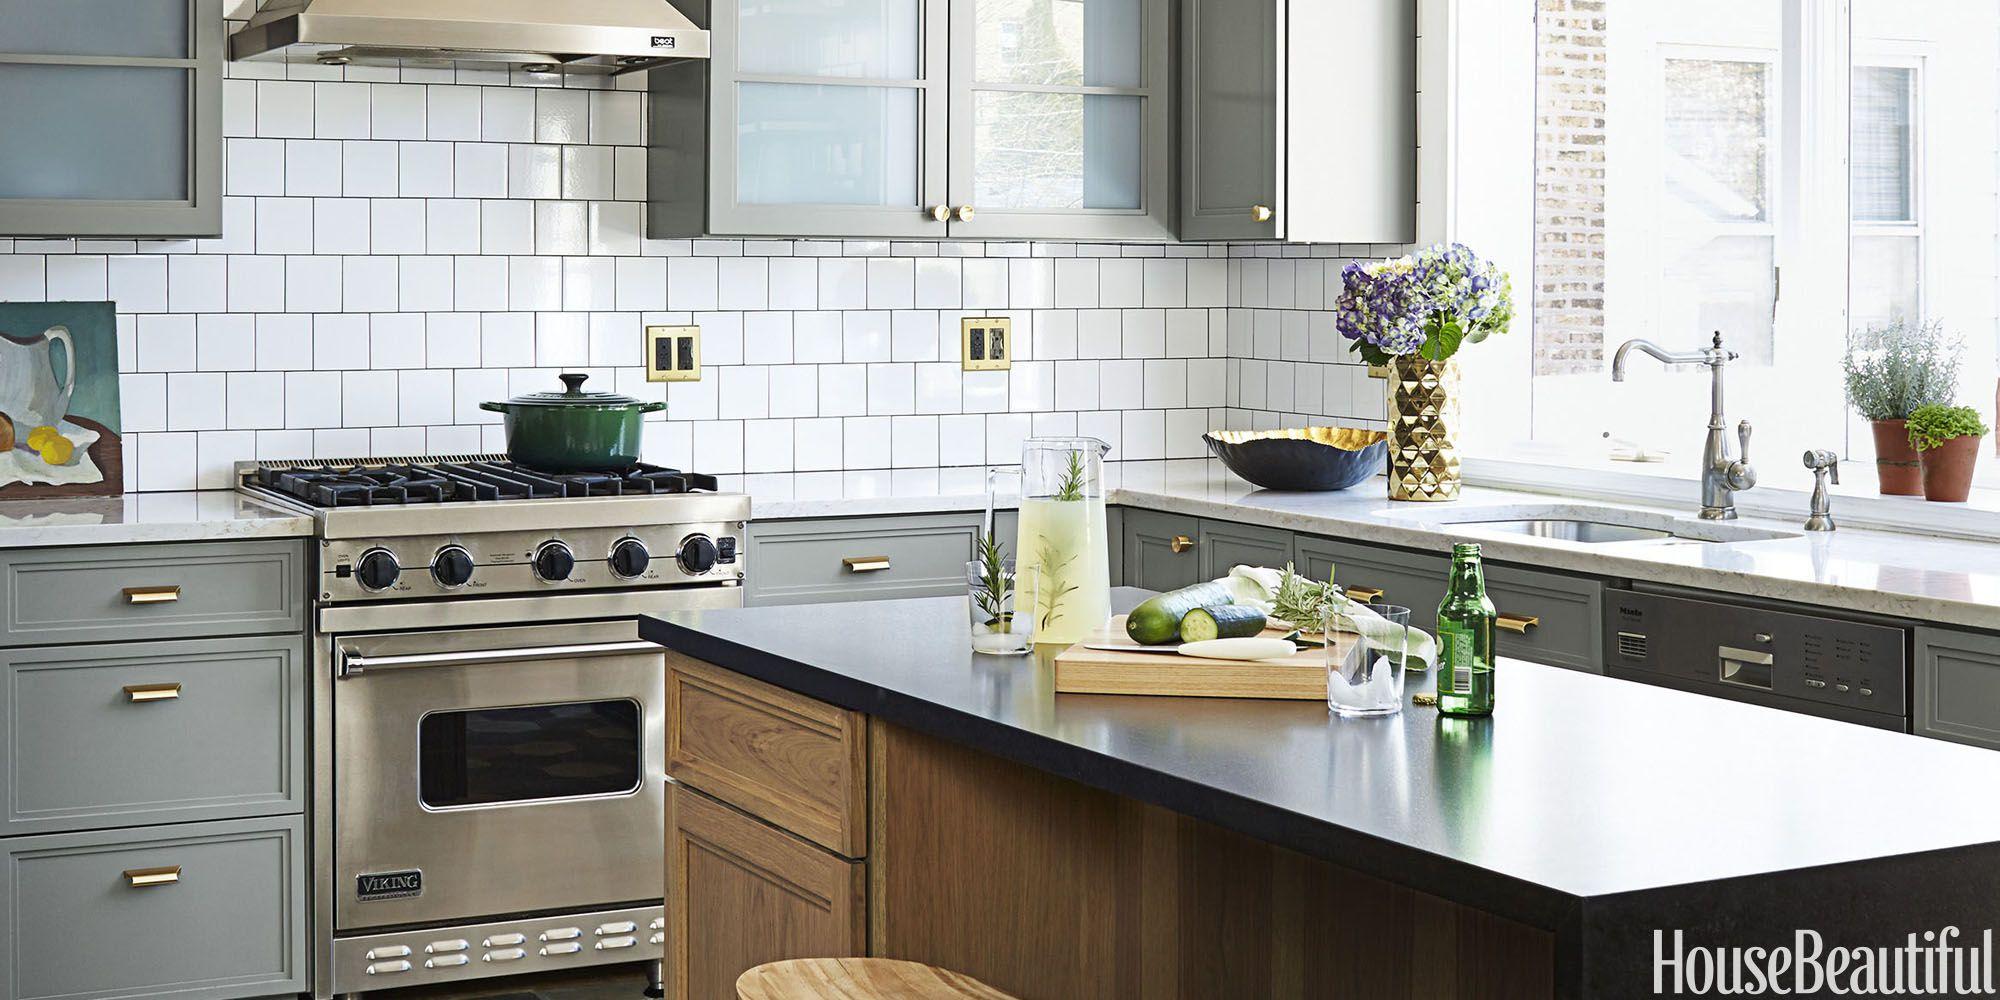 backsplash ideas for small kitchen glass tile best designs backsplashes